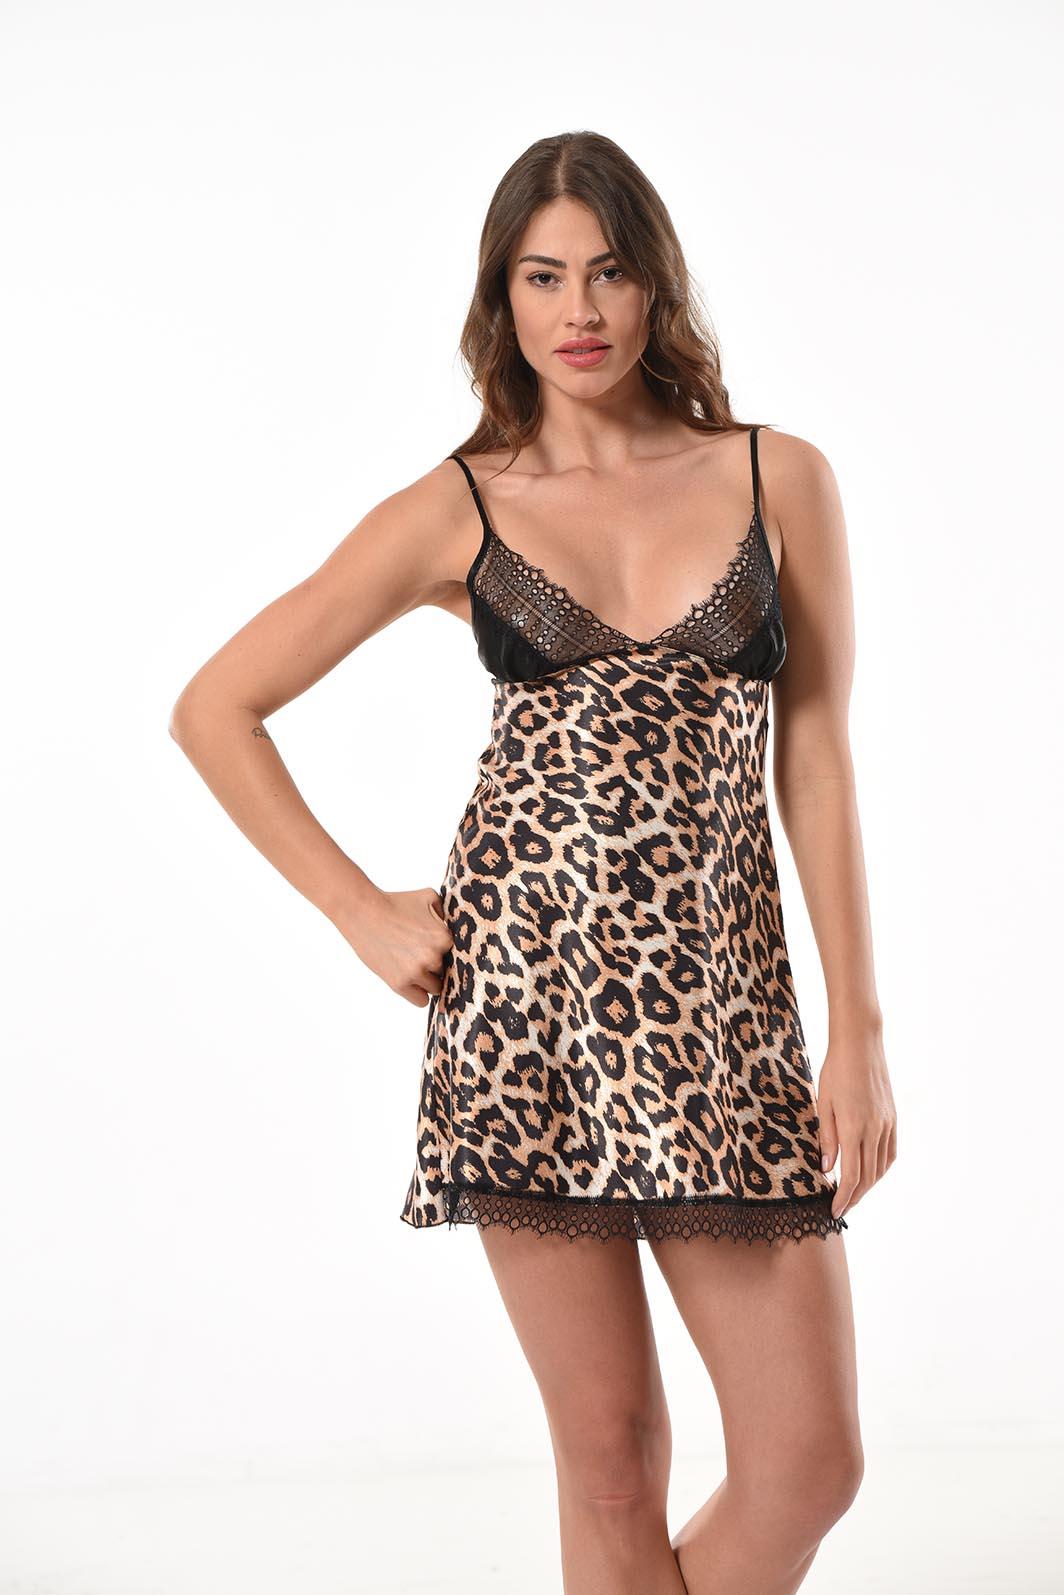 Vestido de noche de raso (Modelo 1164)